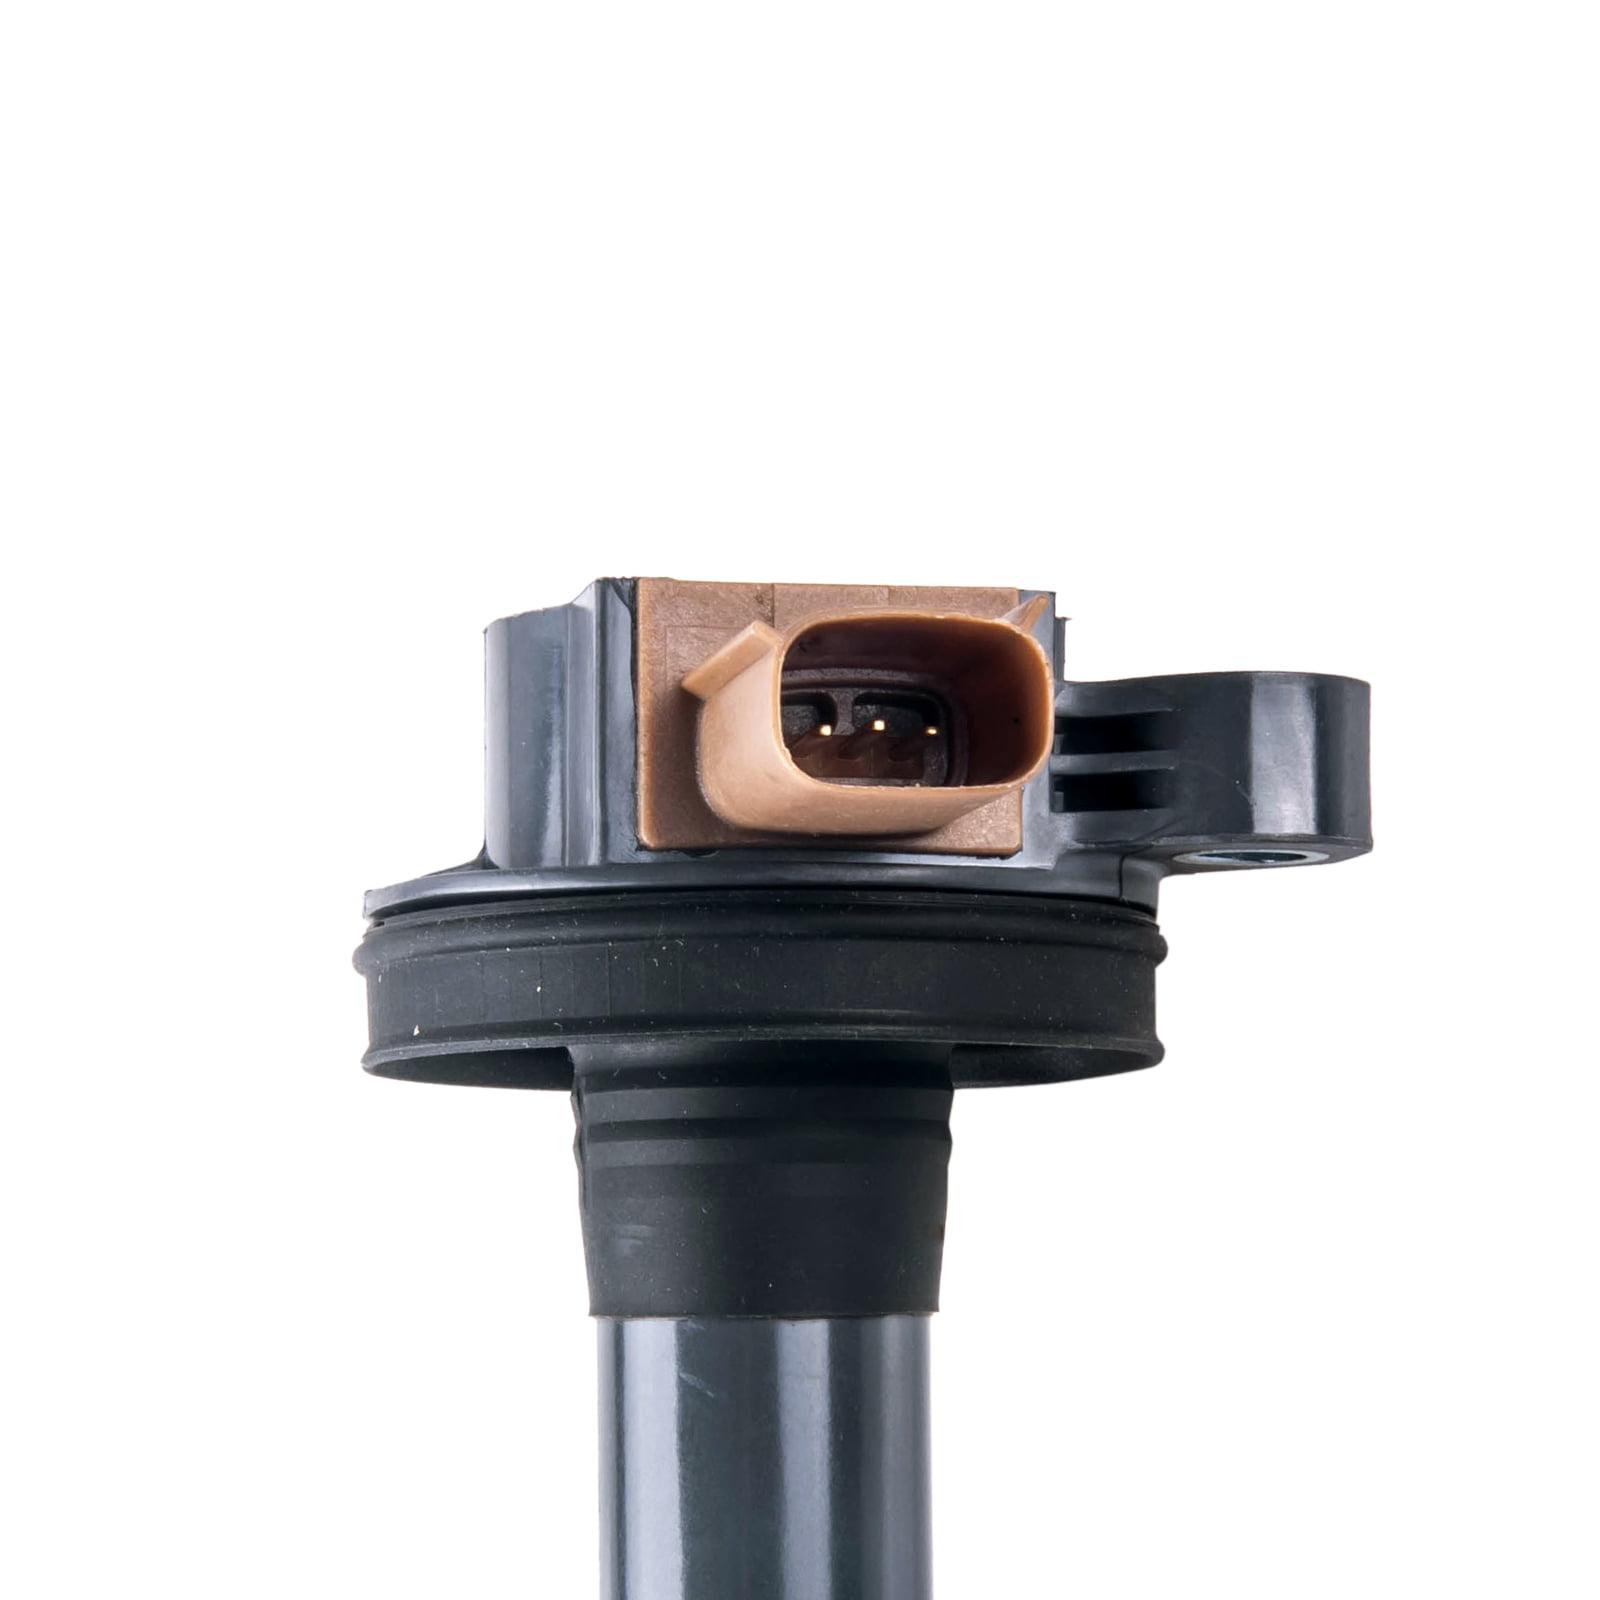 6 Pack Ignition Coils for Ford F-150 Explorer Lincoln Ecoboost 3.5L DG549 UF646